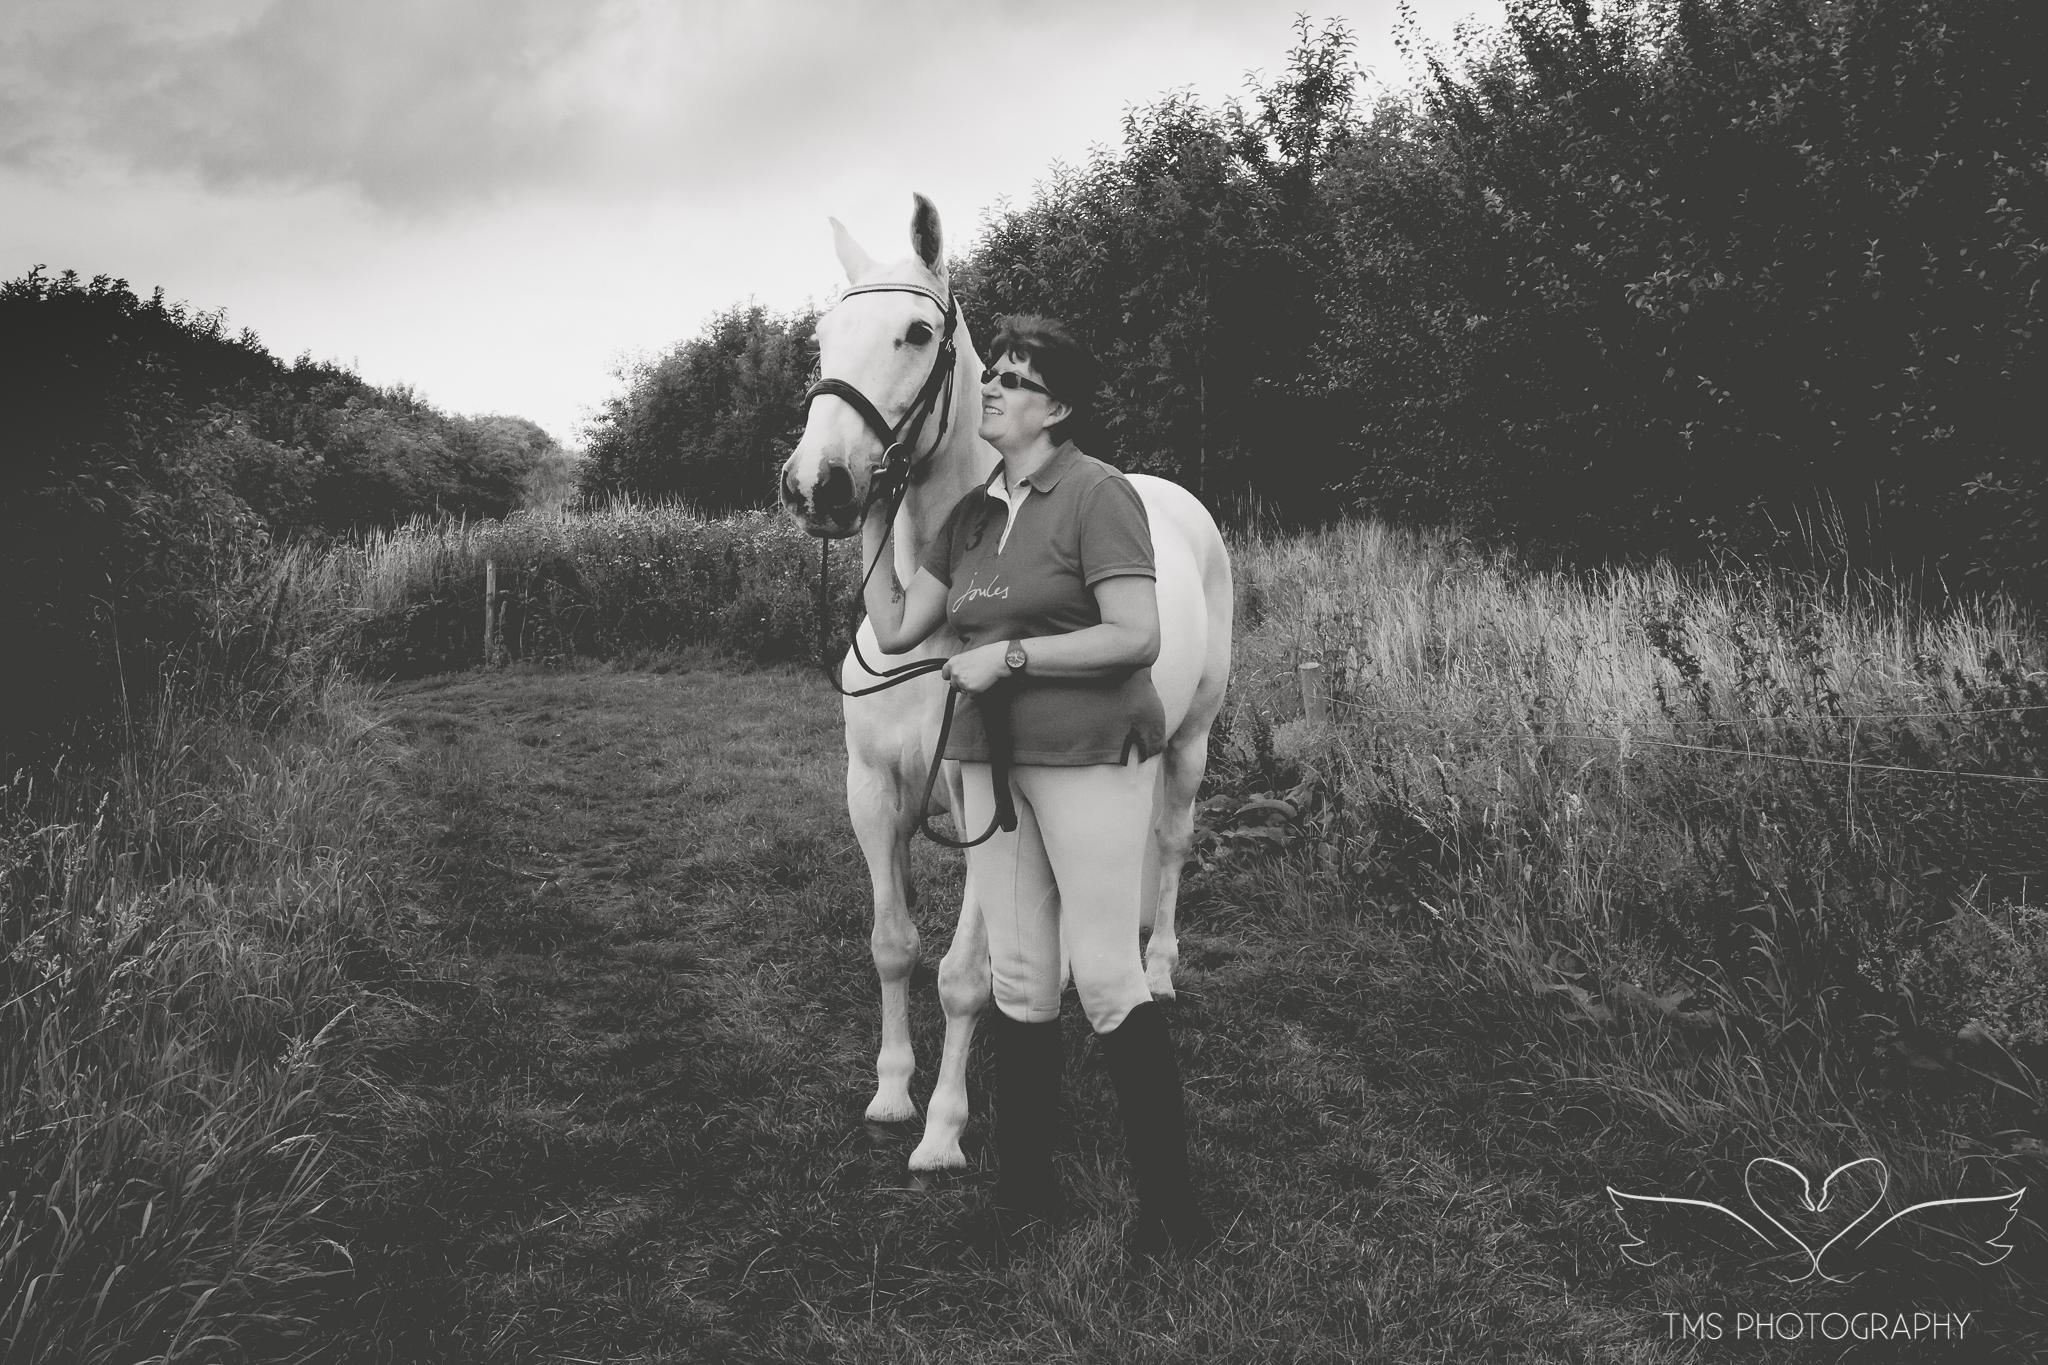 equine_photographer_Derbyshire-6